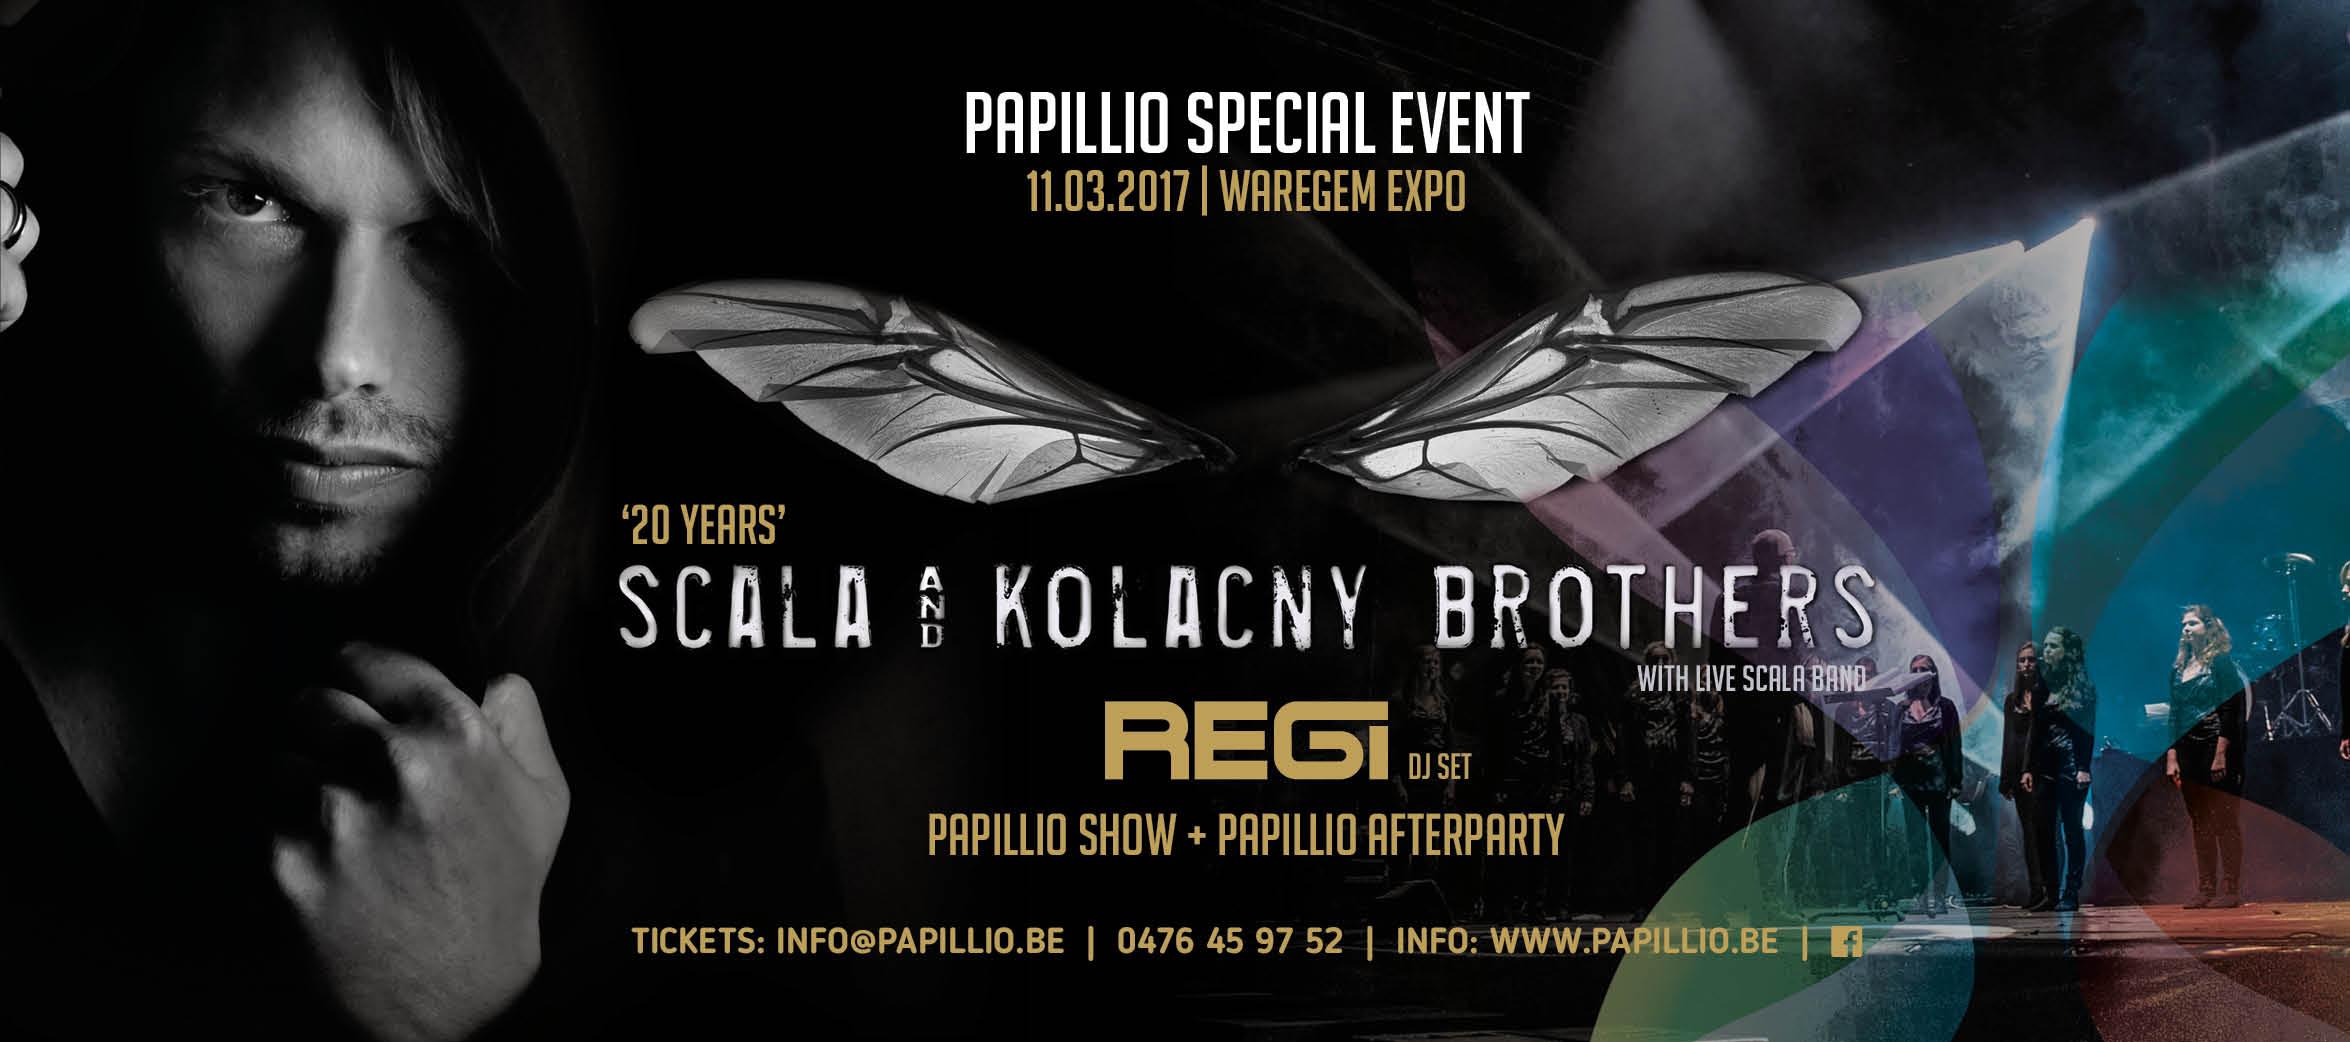 20 Years Scala & Kolacny Brothers + REGI (DJ SET)